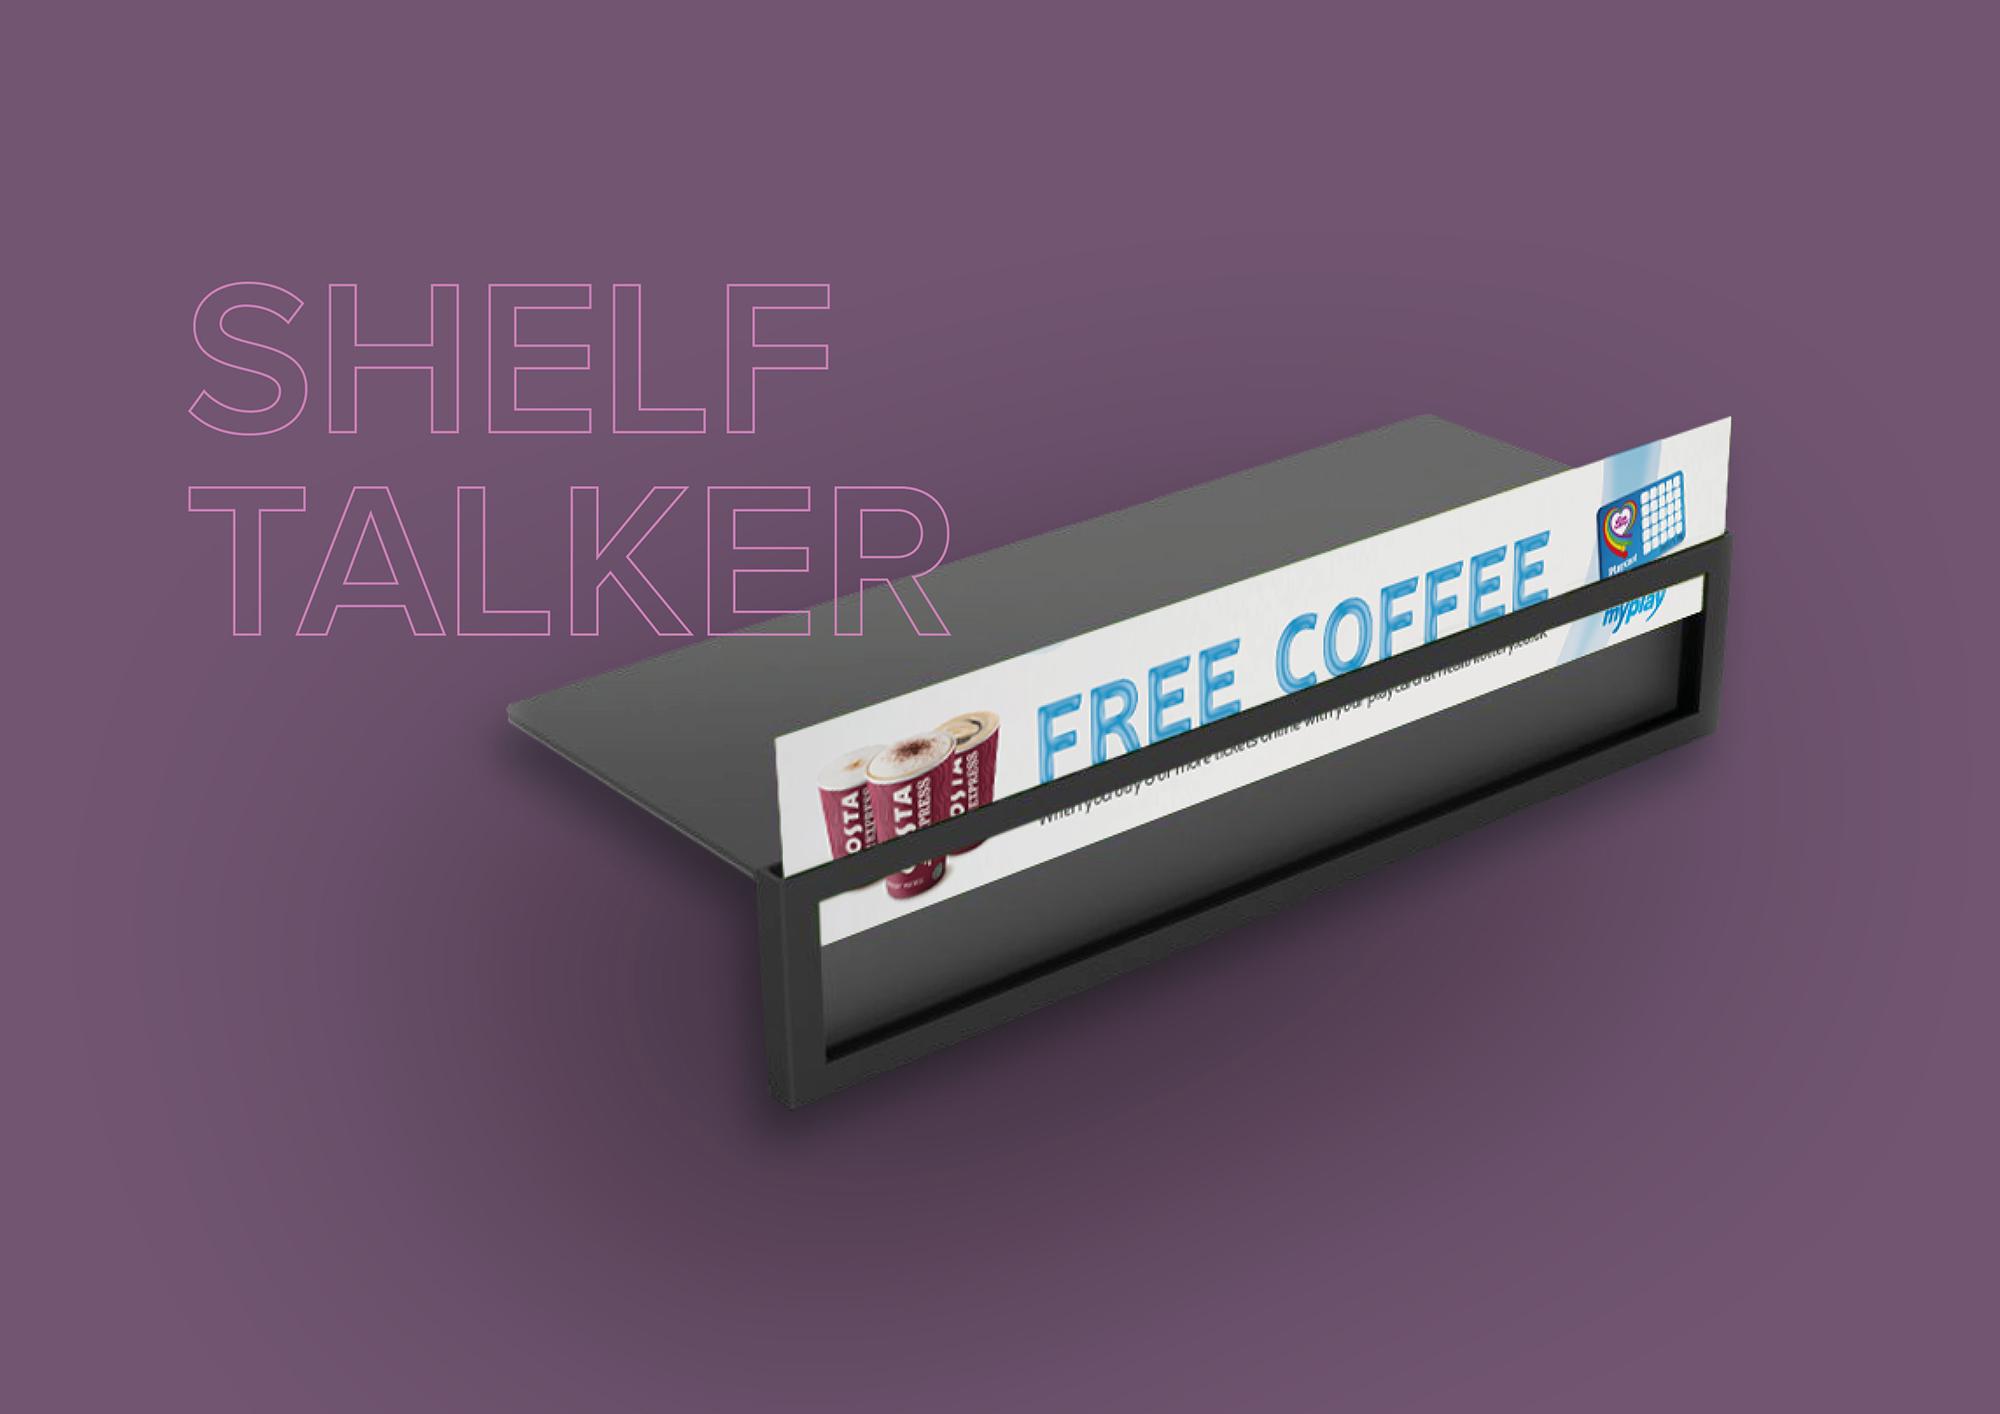 myplay-shelf talker.jpg